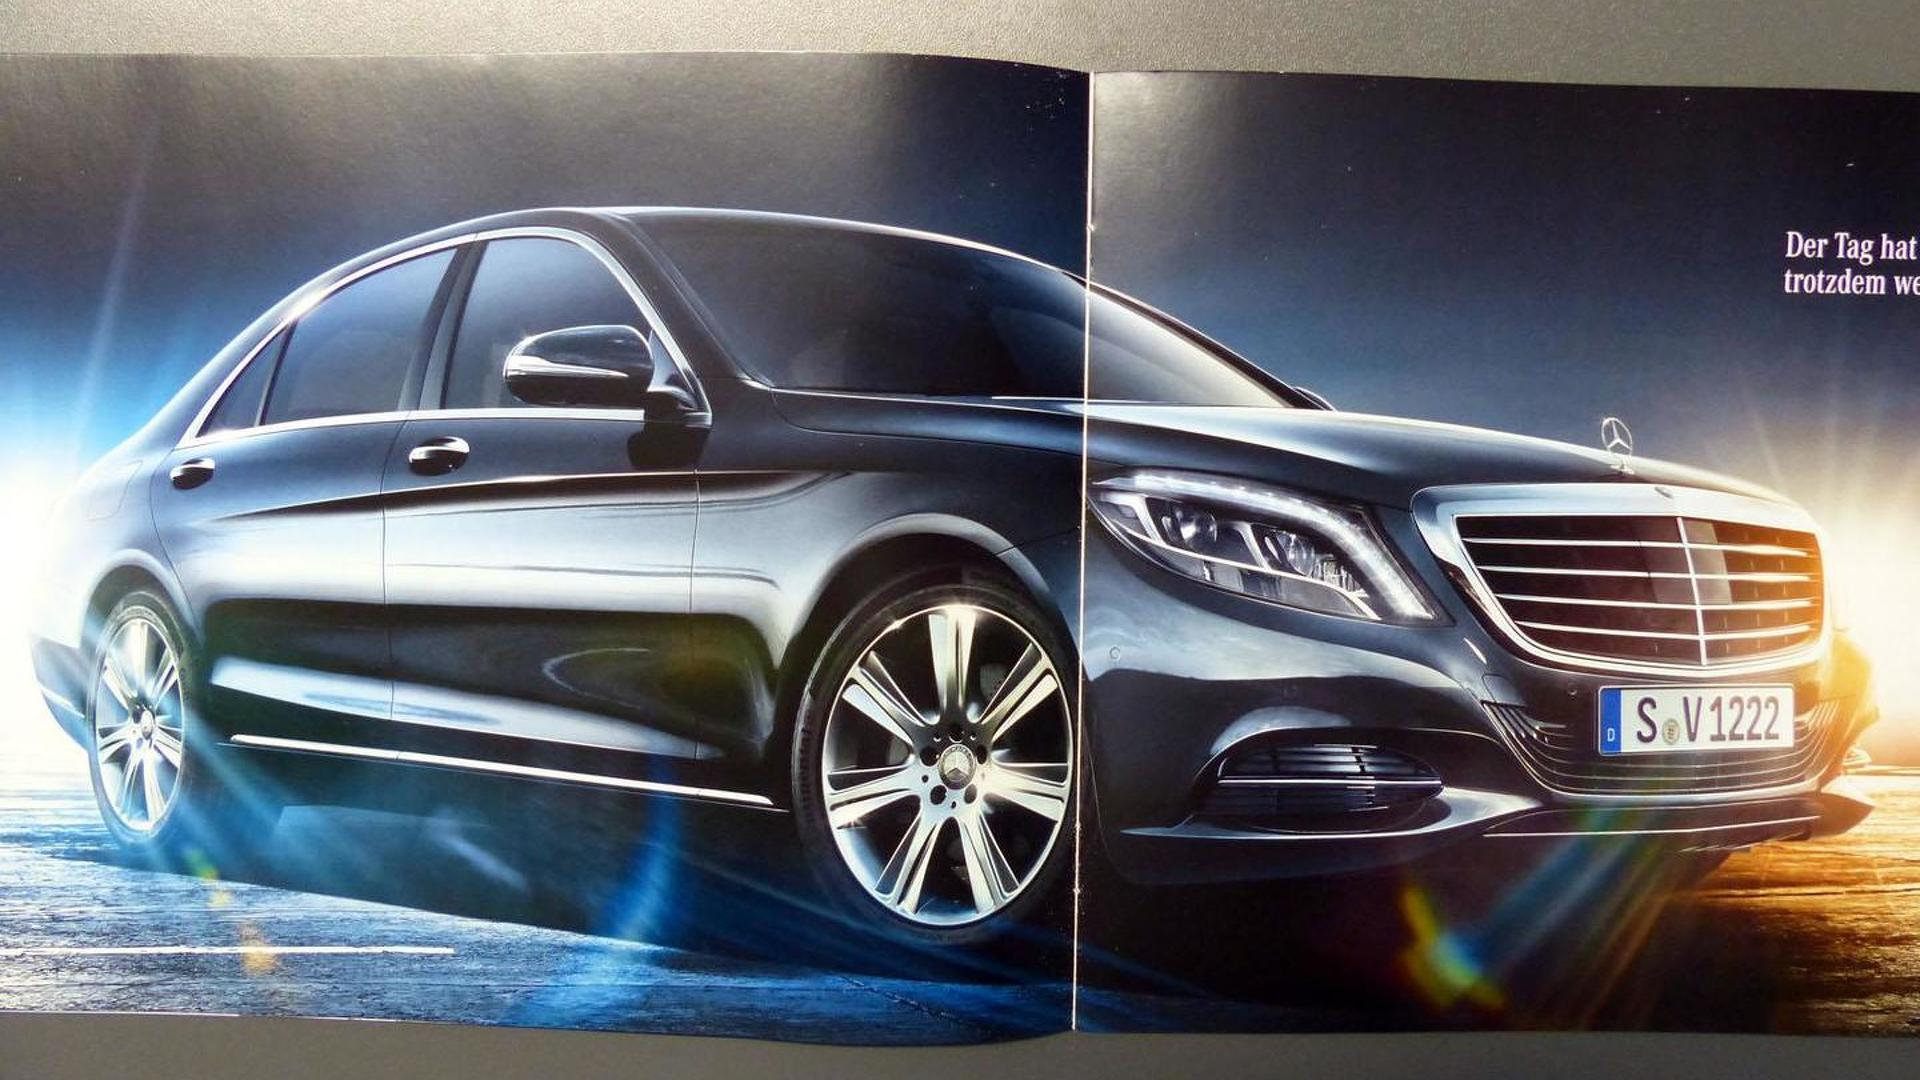 2014 Mercedes S-Class brochure leaked